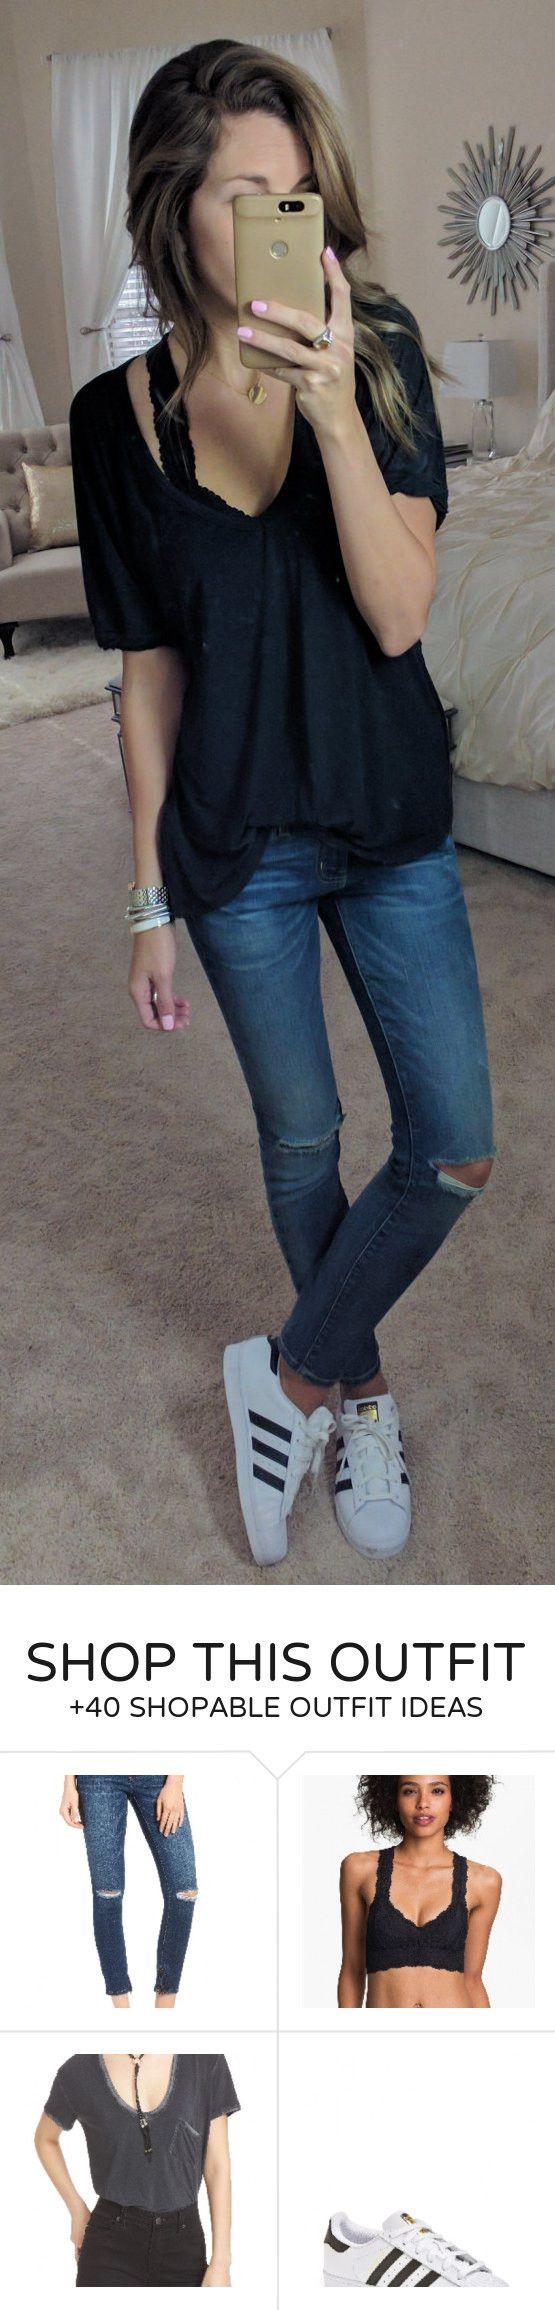 0b51cfac1689  spring  fashion   Black Top   Destroyed Skinny Jeans   White Adidas  Sneakers